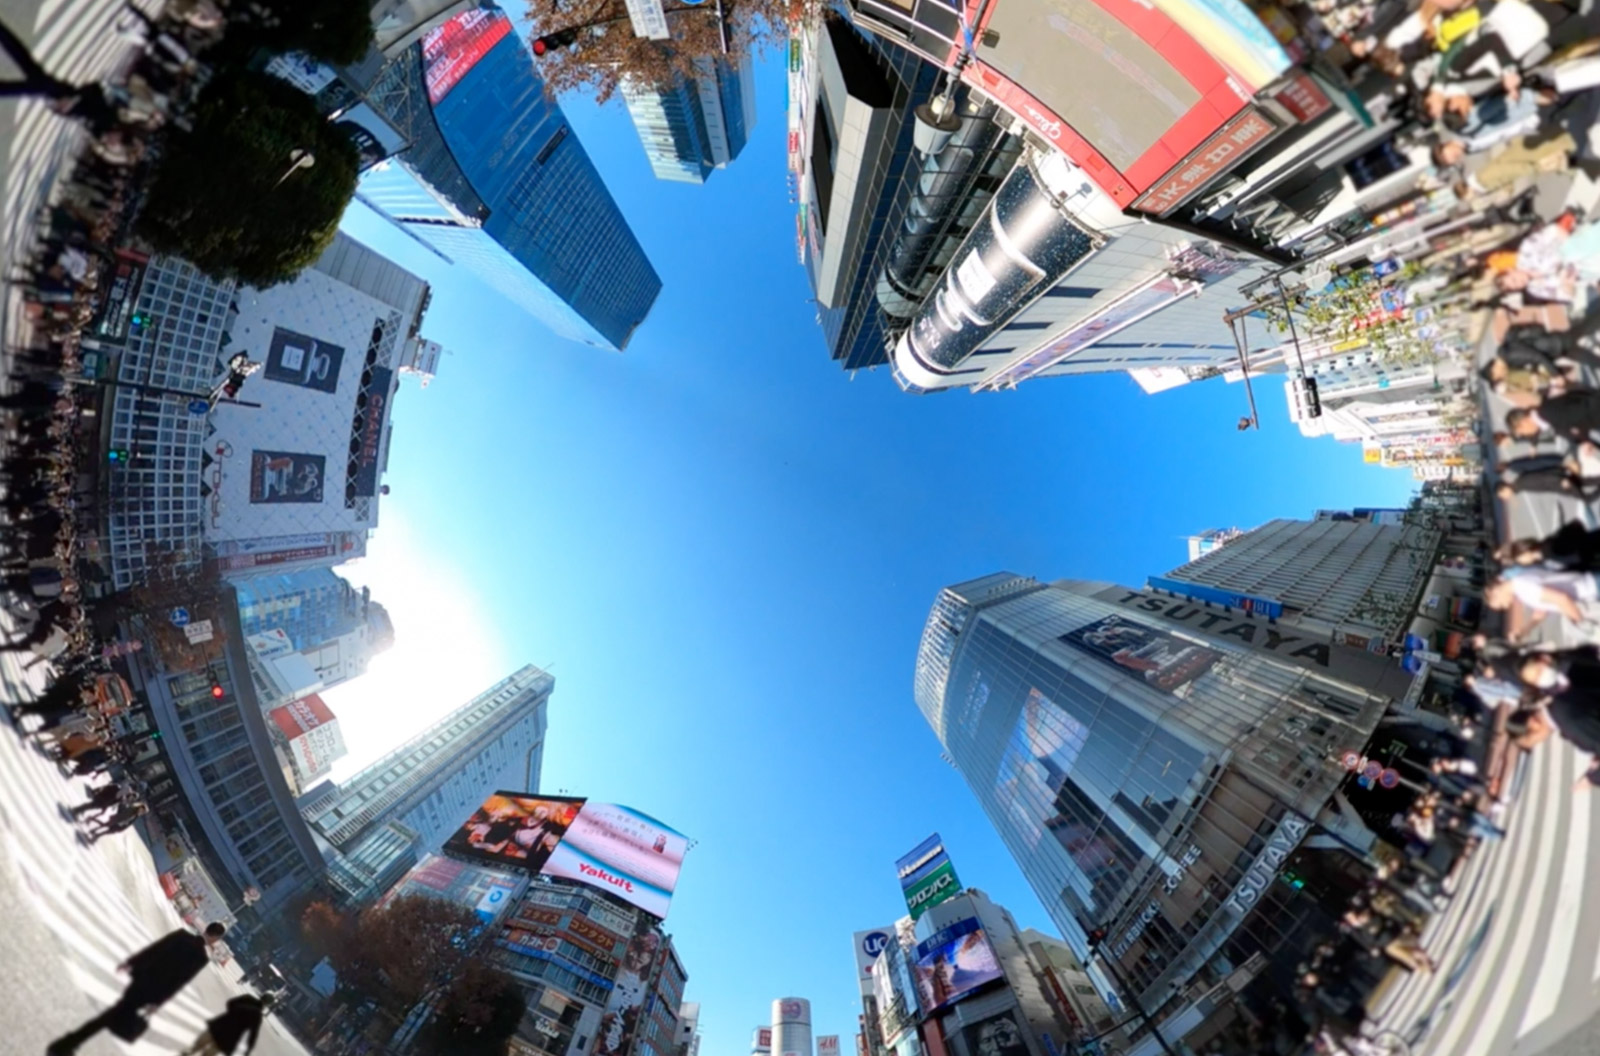 360 degree video showing walking on Shibuya Crossing in Japan